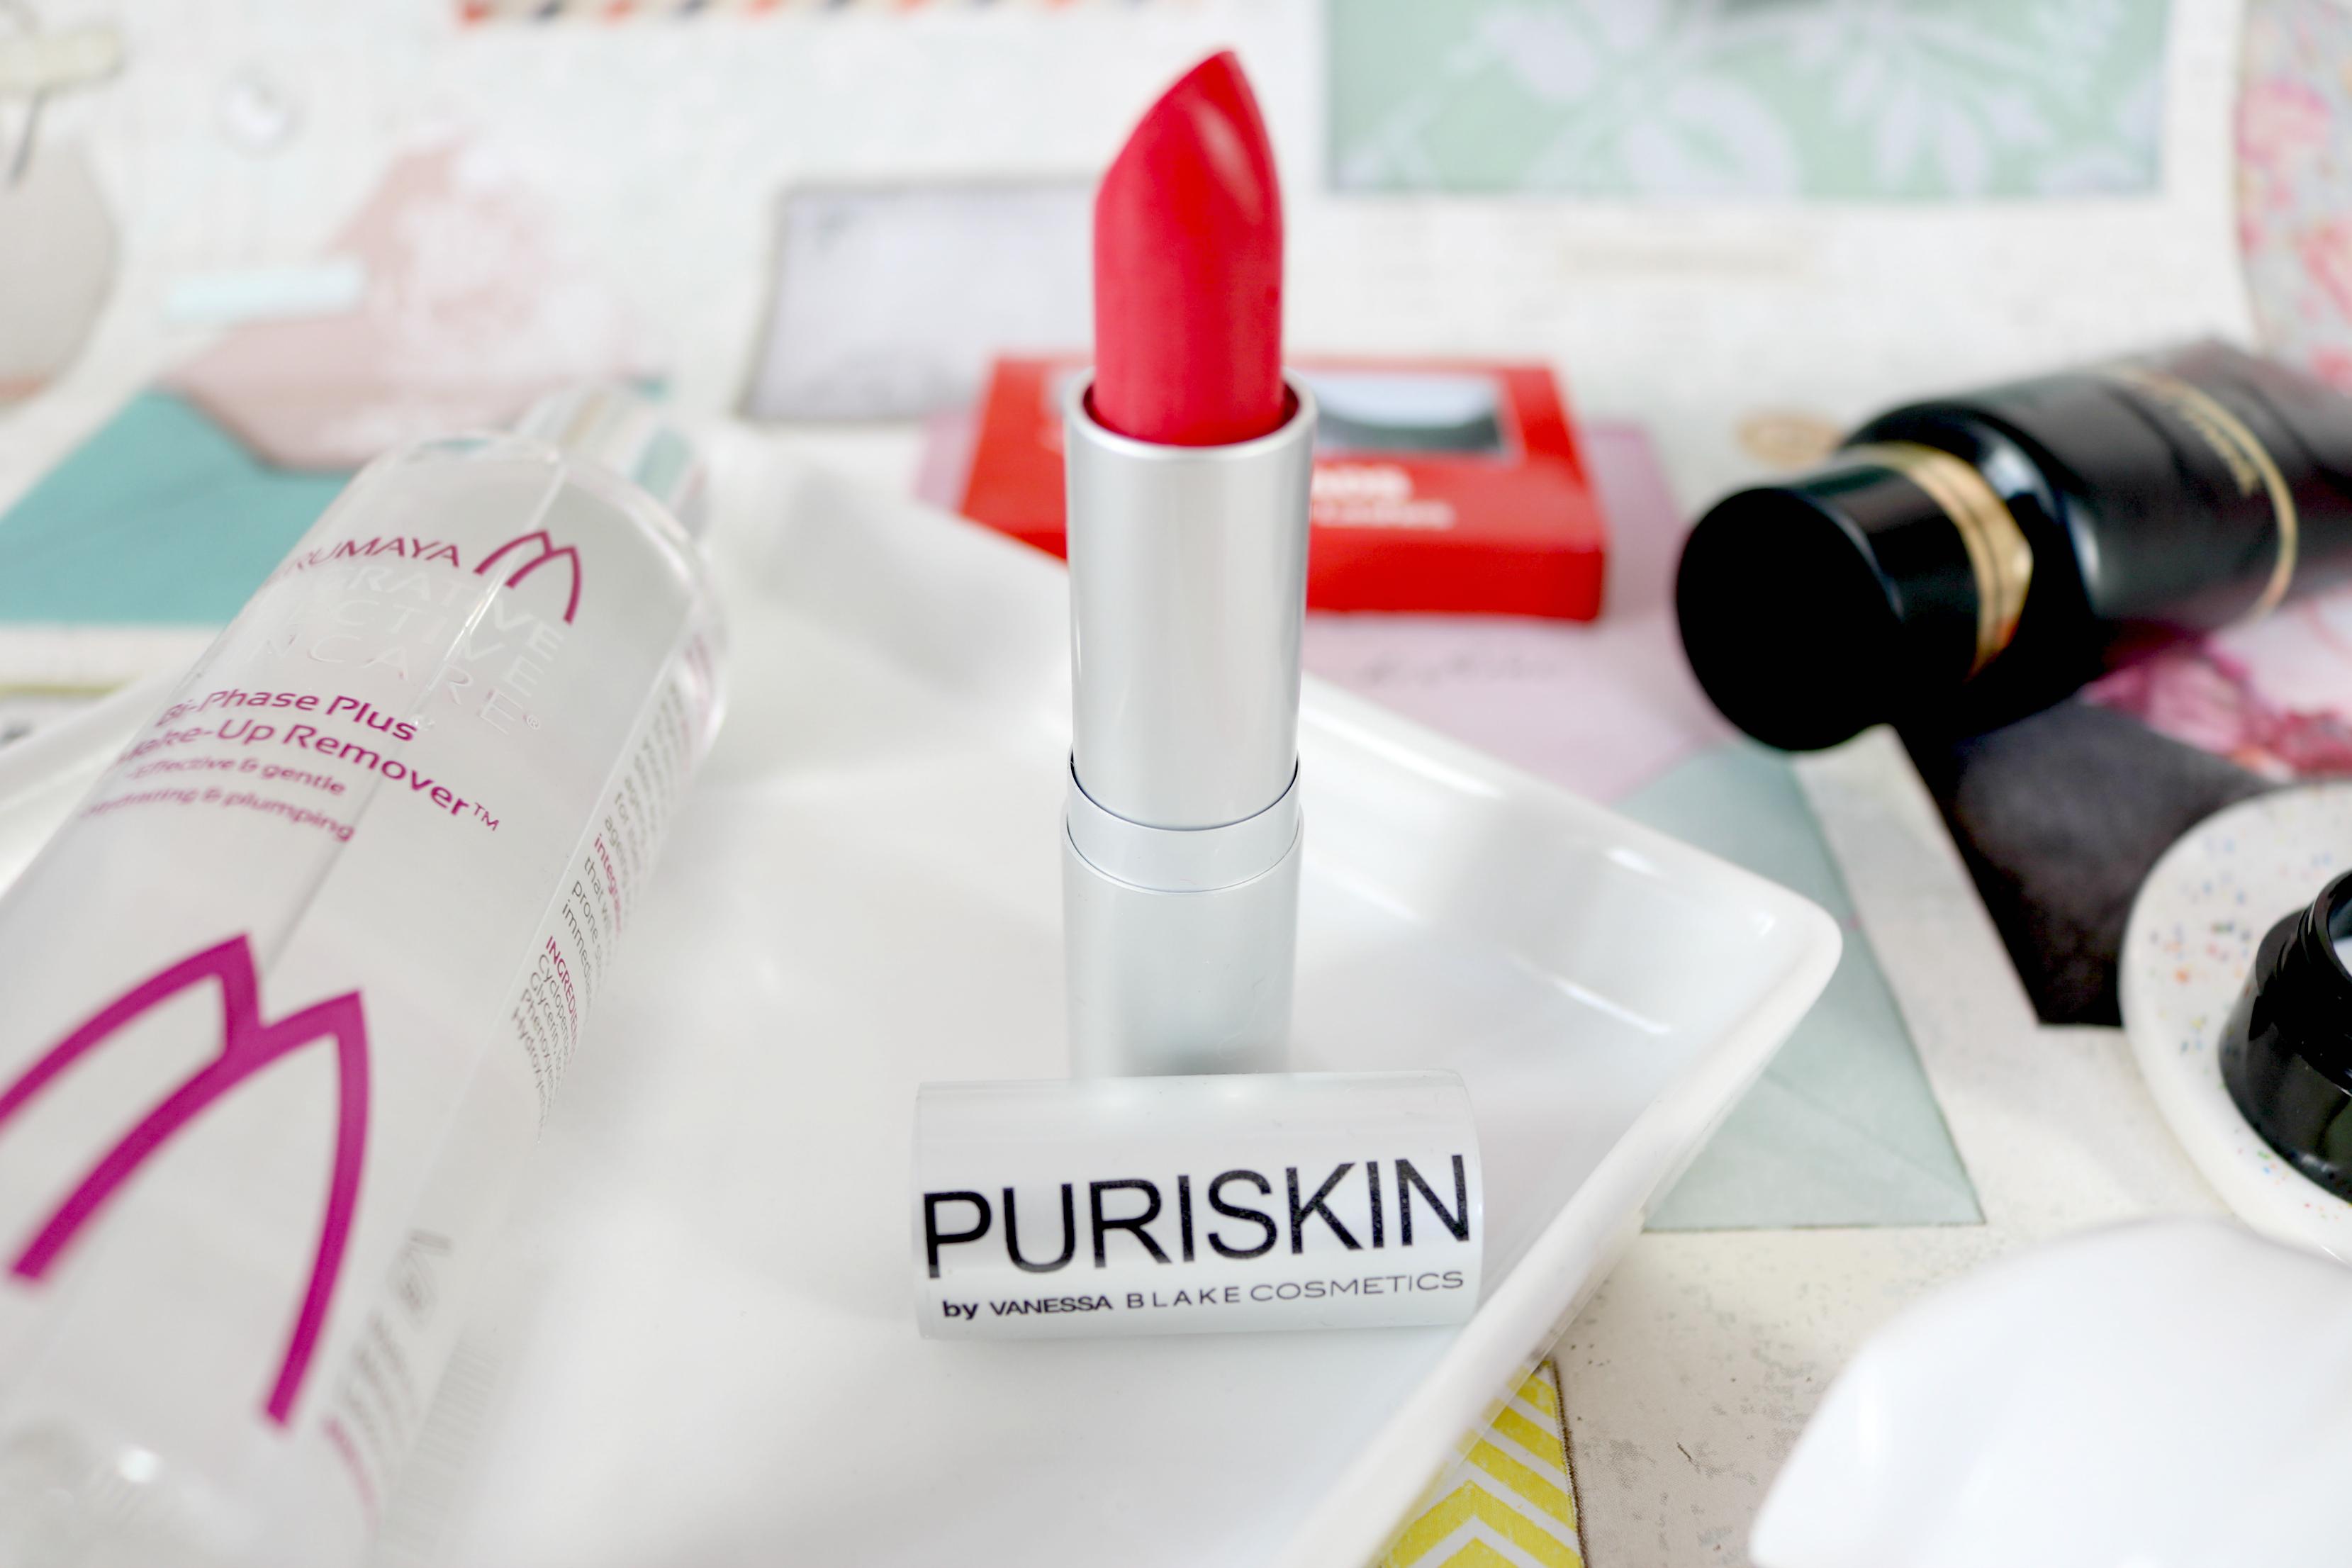 Jodetopia Beauty Blogger Box Review Puriskin Lipstick